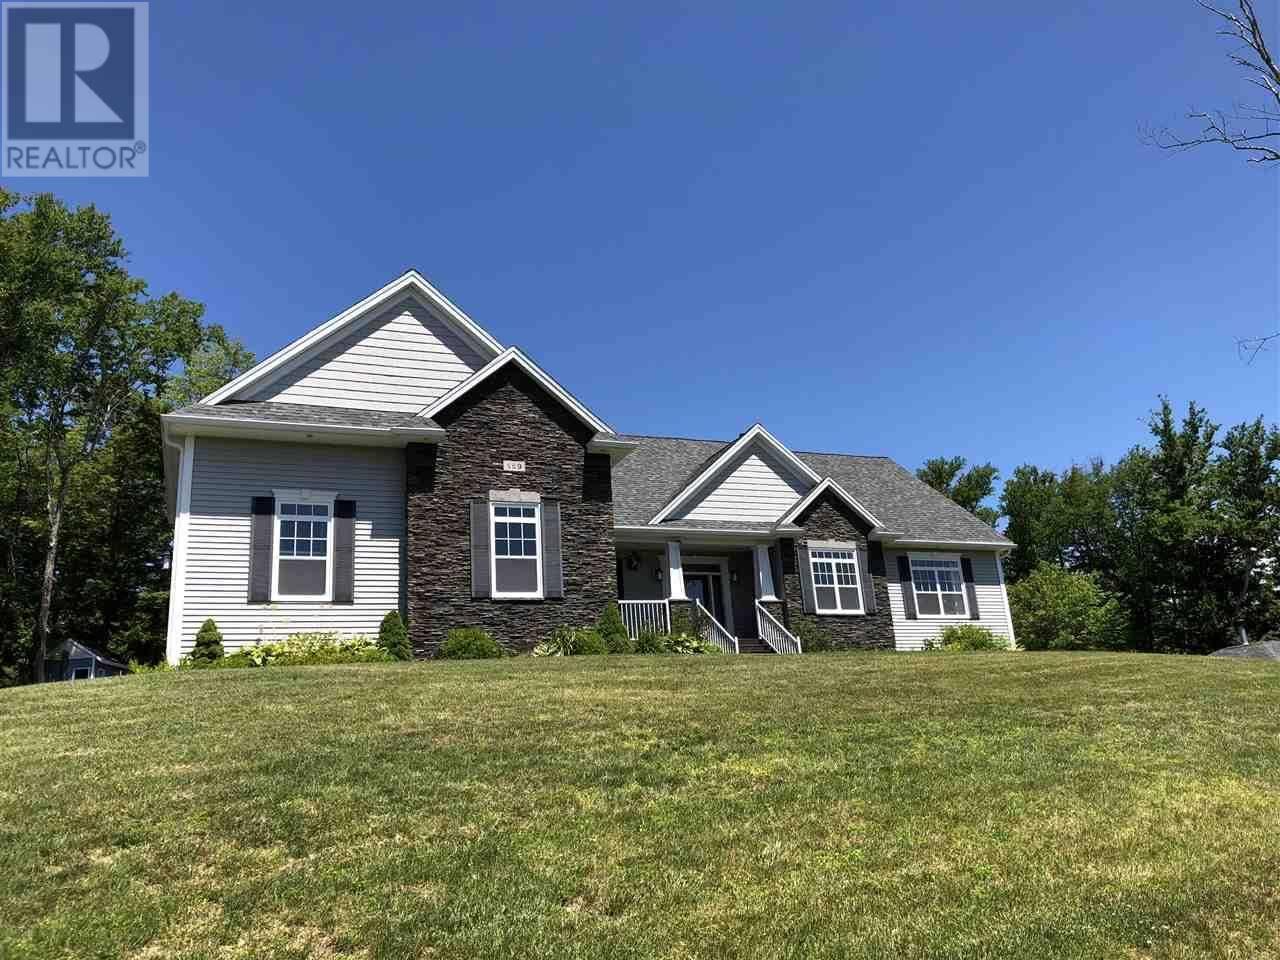 House for sale at 159 Dunsmore Dr Fall River Nova Scotia - MLS: 201916087